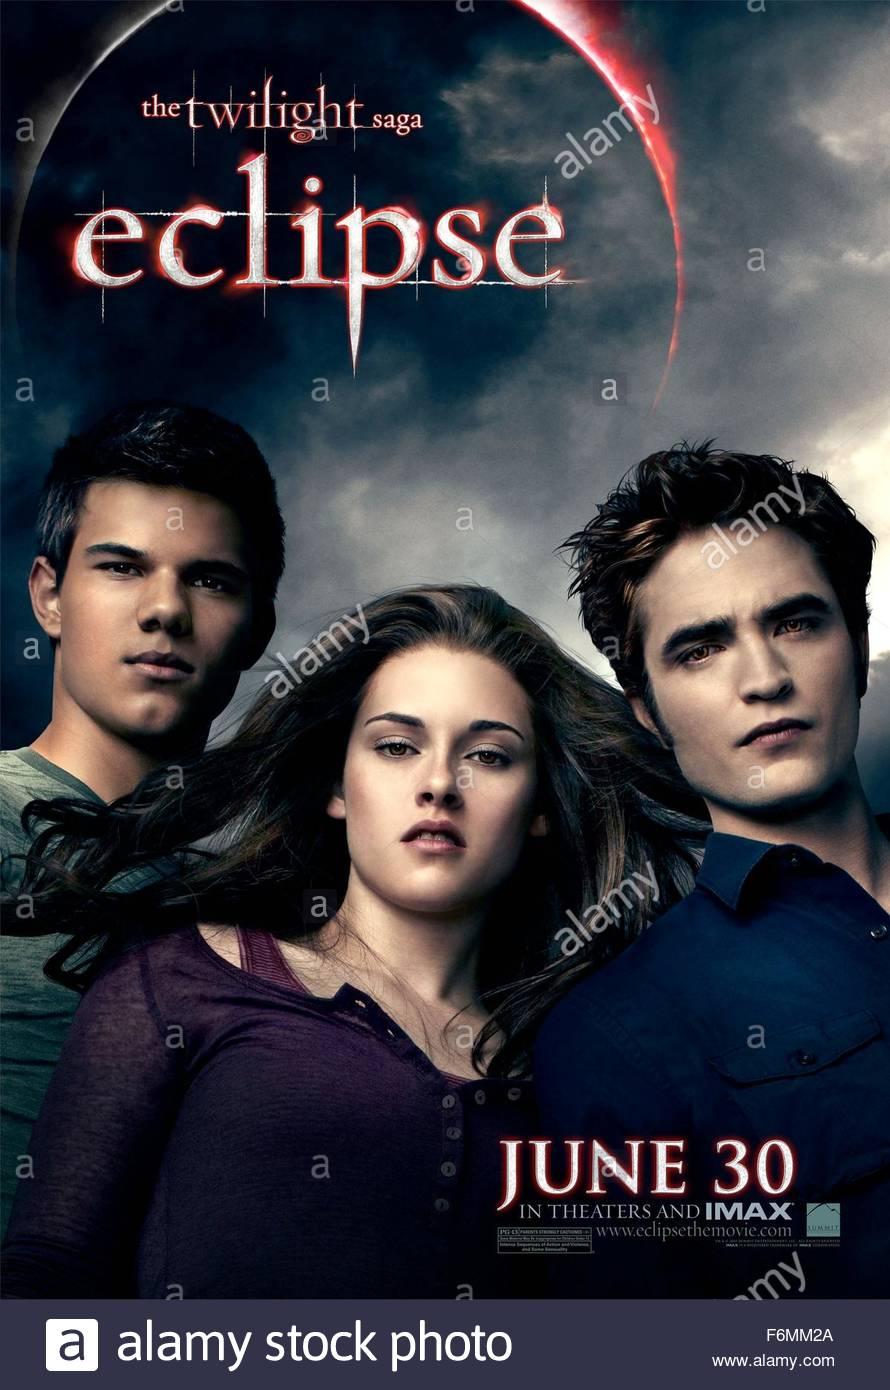 Twilight release date in Melbourne